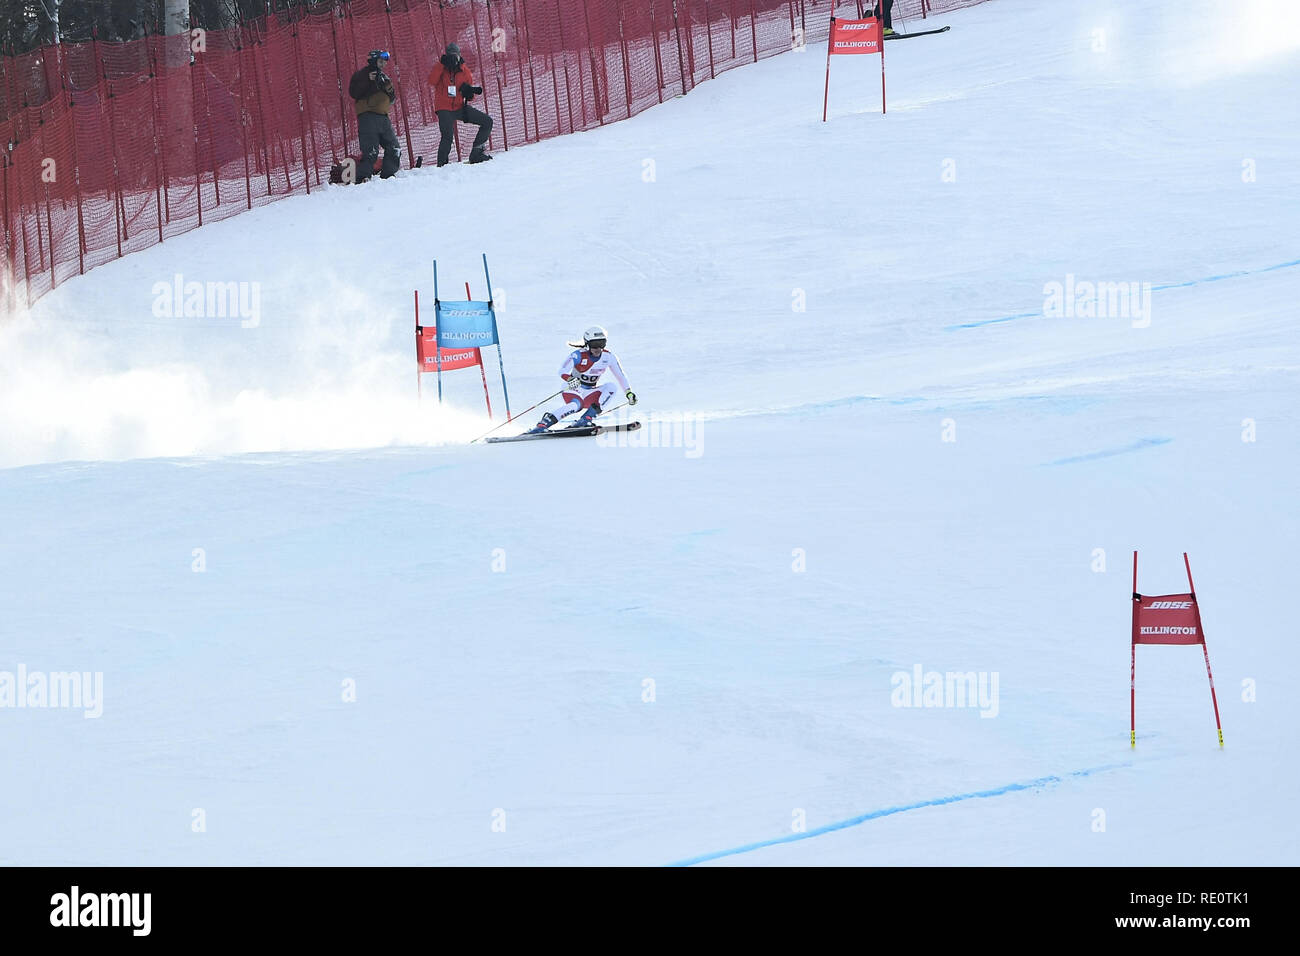 KILLINGTON, VT - 24 de noviembre: Andrea Ellenberger de SUI en el área después de finalizar la segunda carrera del slalom gigante en el Audi FIS de la Copa del Mundo de Esquí. Foto de stock